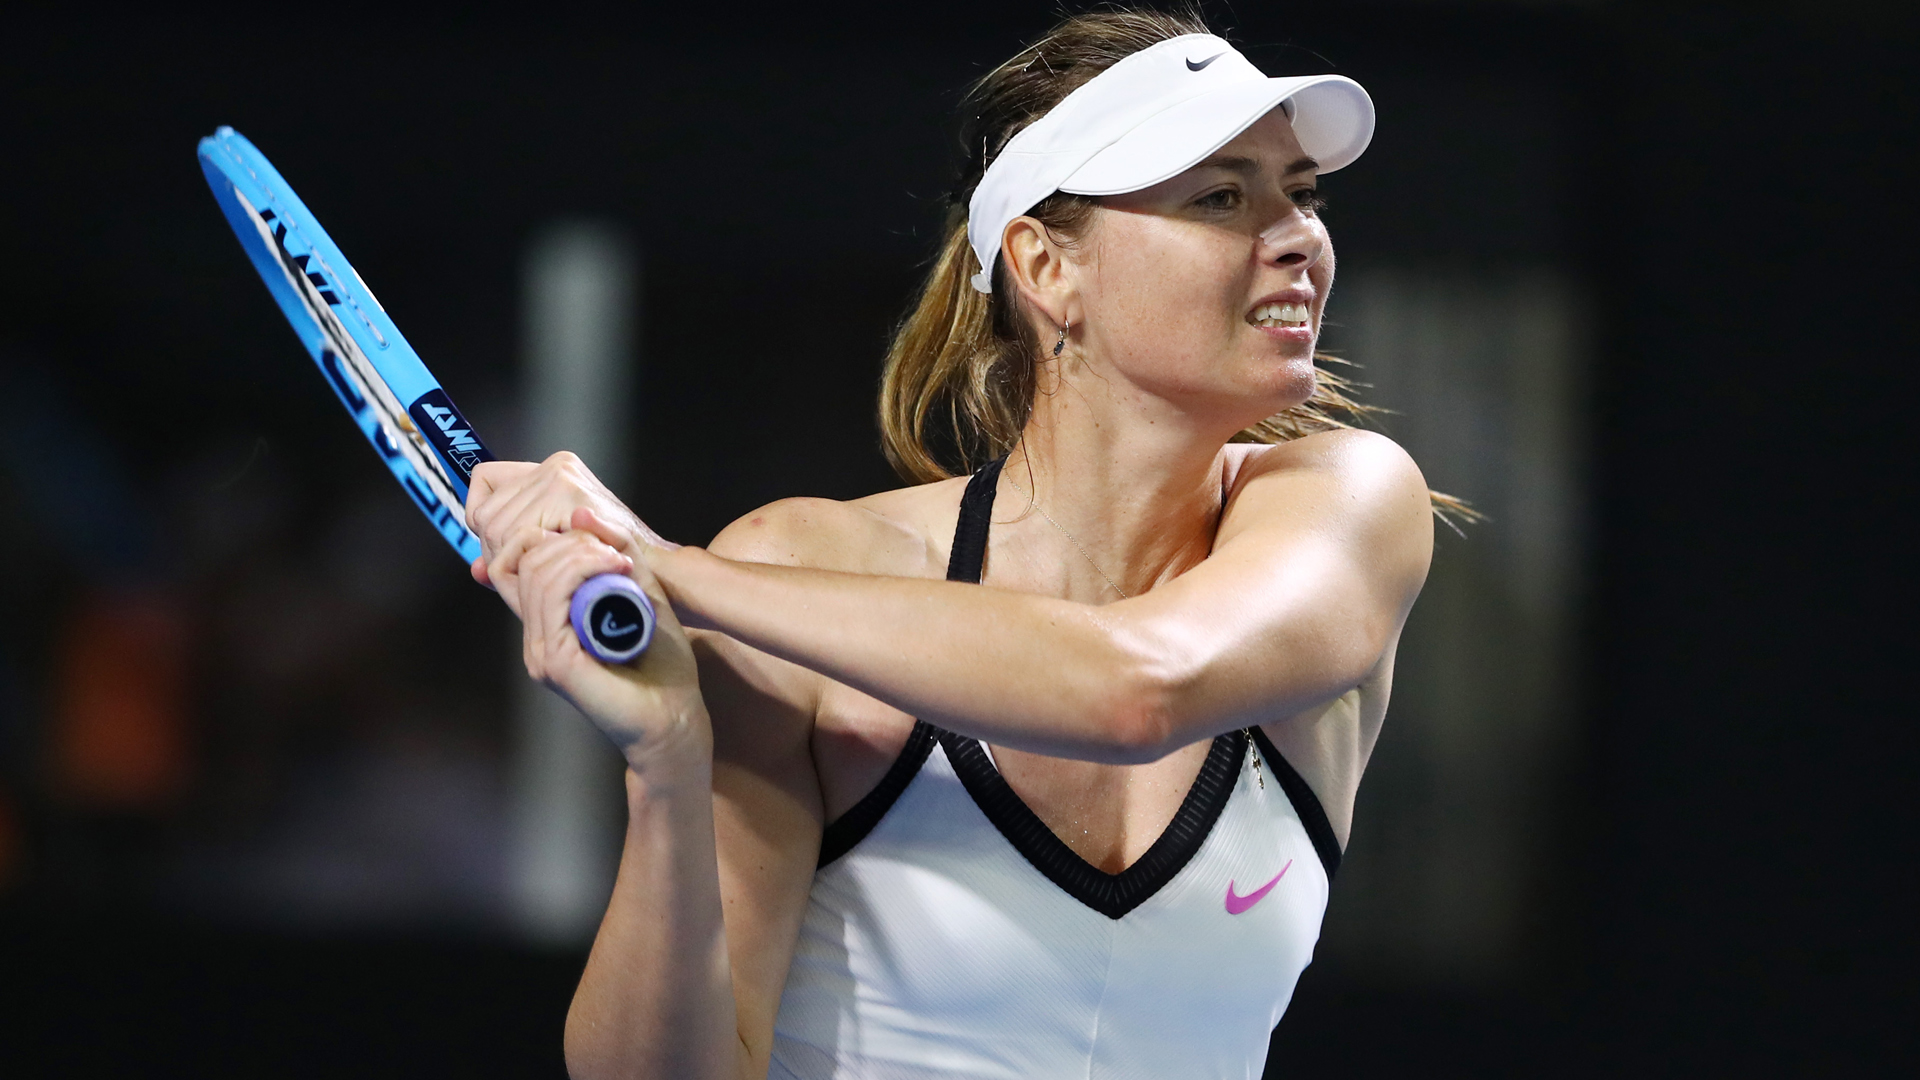 Maria Sharapova retires from tennis